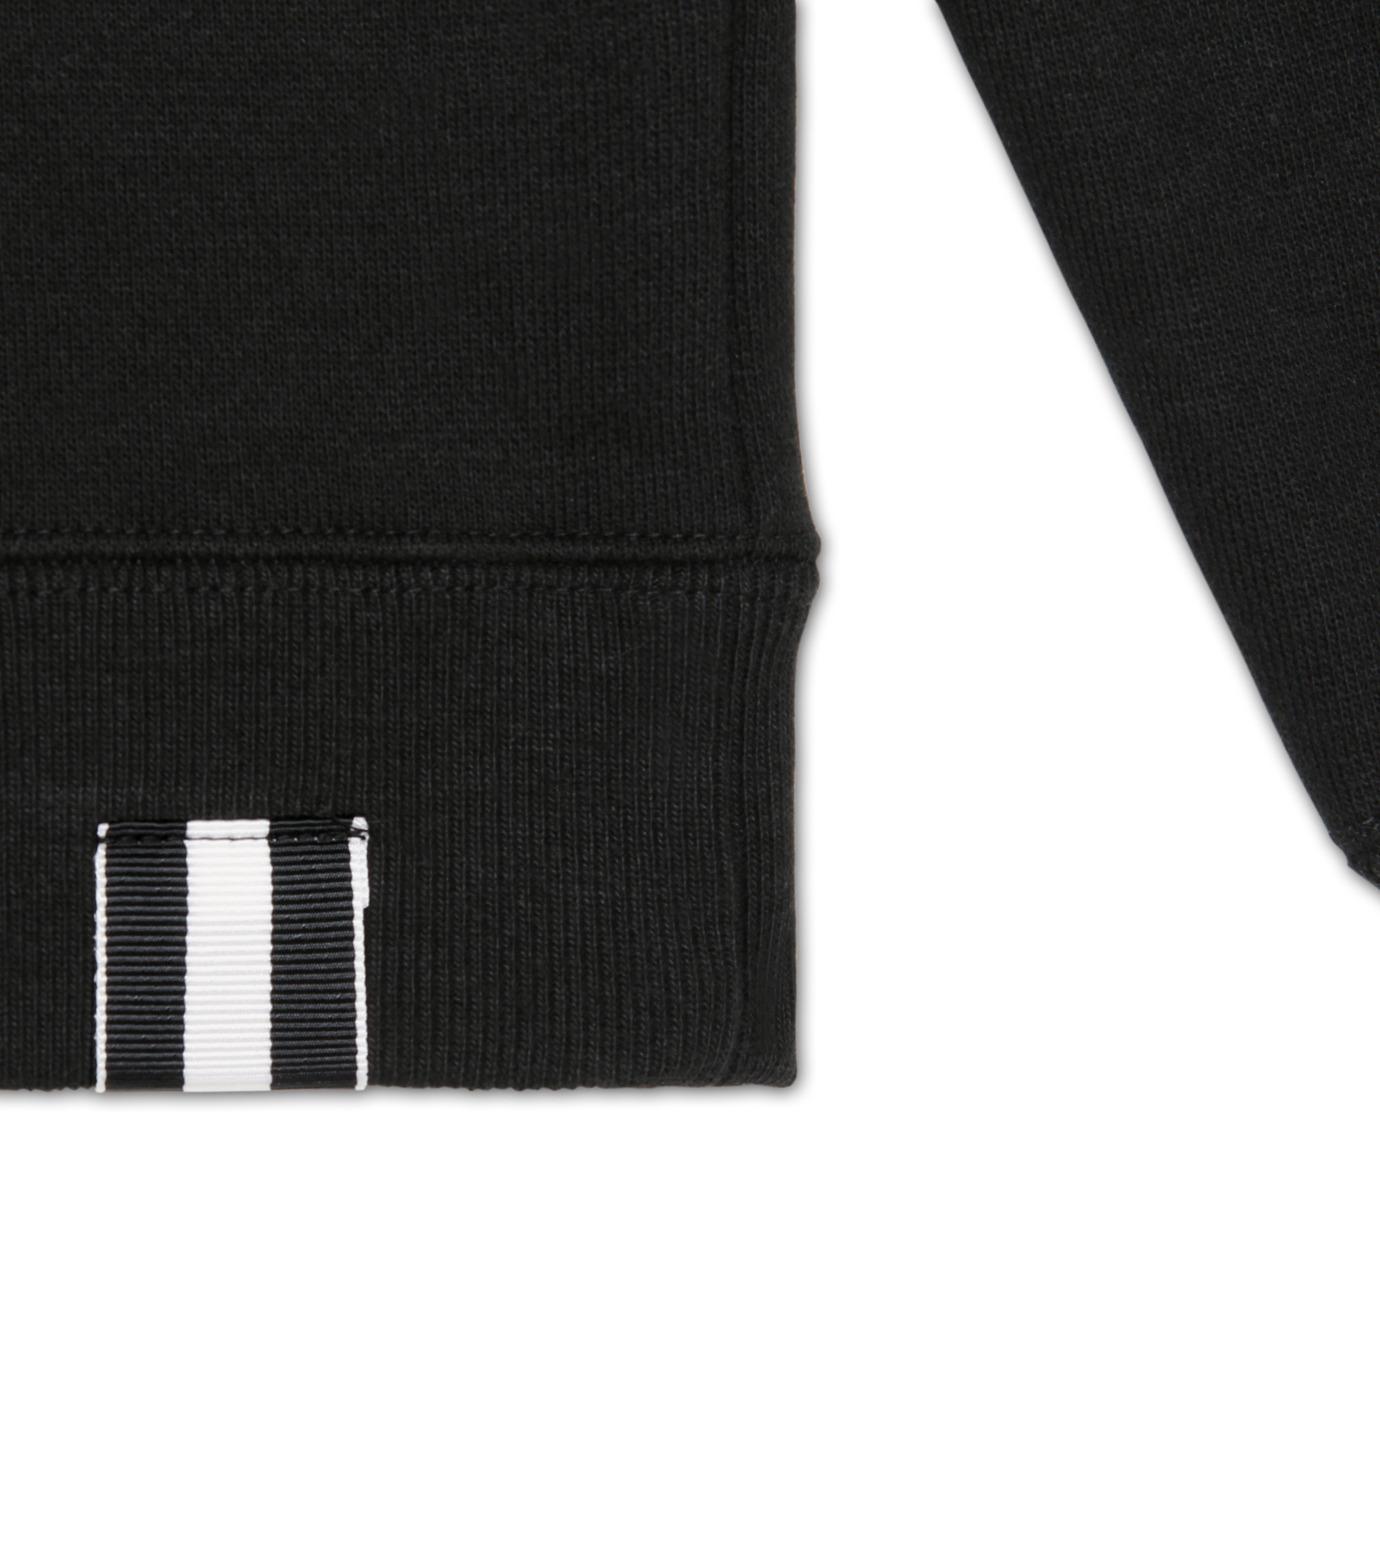 HL HEDDIE LOVU(エイチエル・エディールーヴ)のHEAVY SWEATSHIRT-BLACK(カットソー/cut and sewn)-18S92002-13 拡大詳細画像7